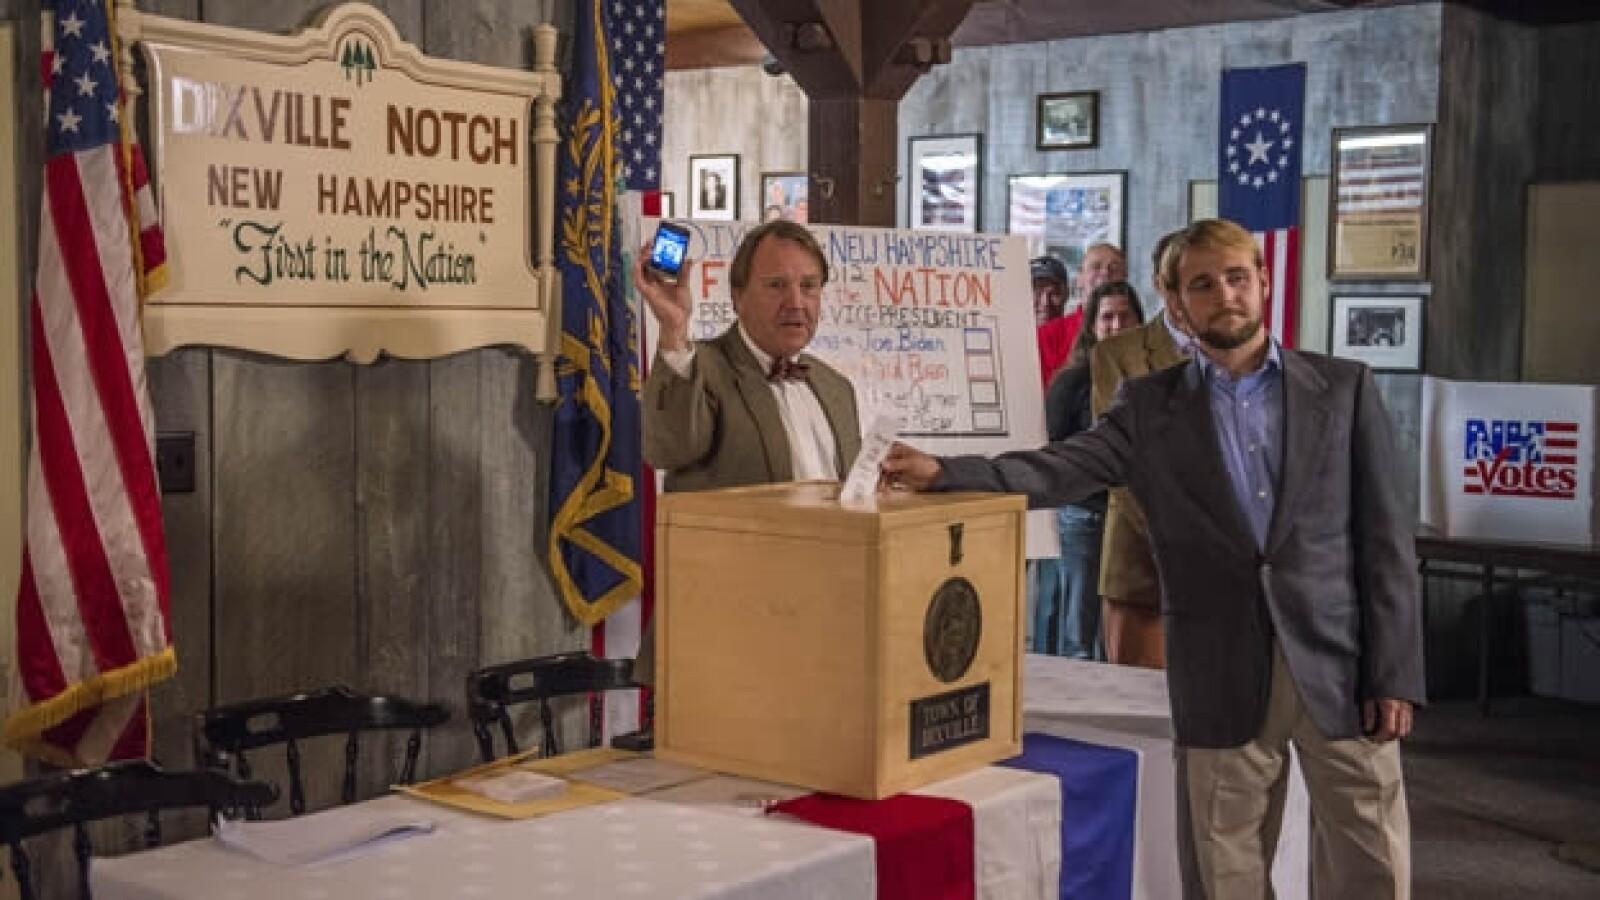 Dixville Notch, New Hampshire, votación EU primeros resultados